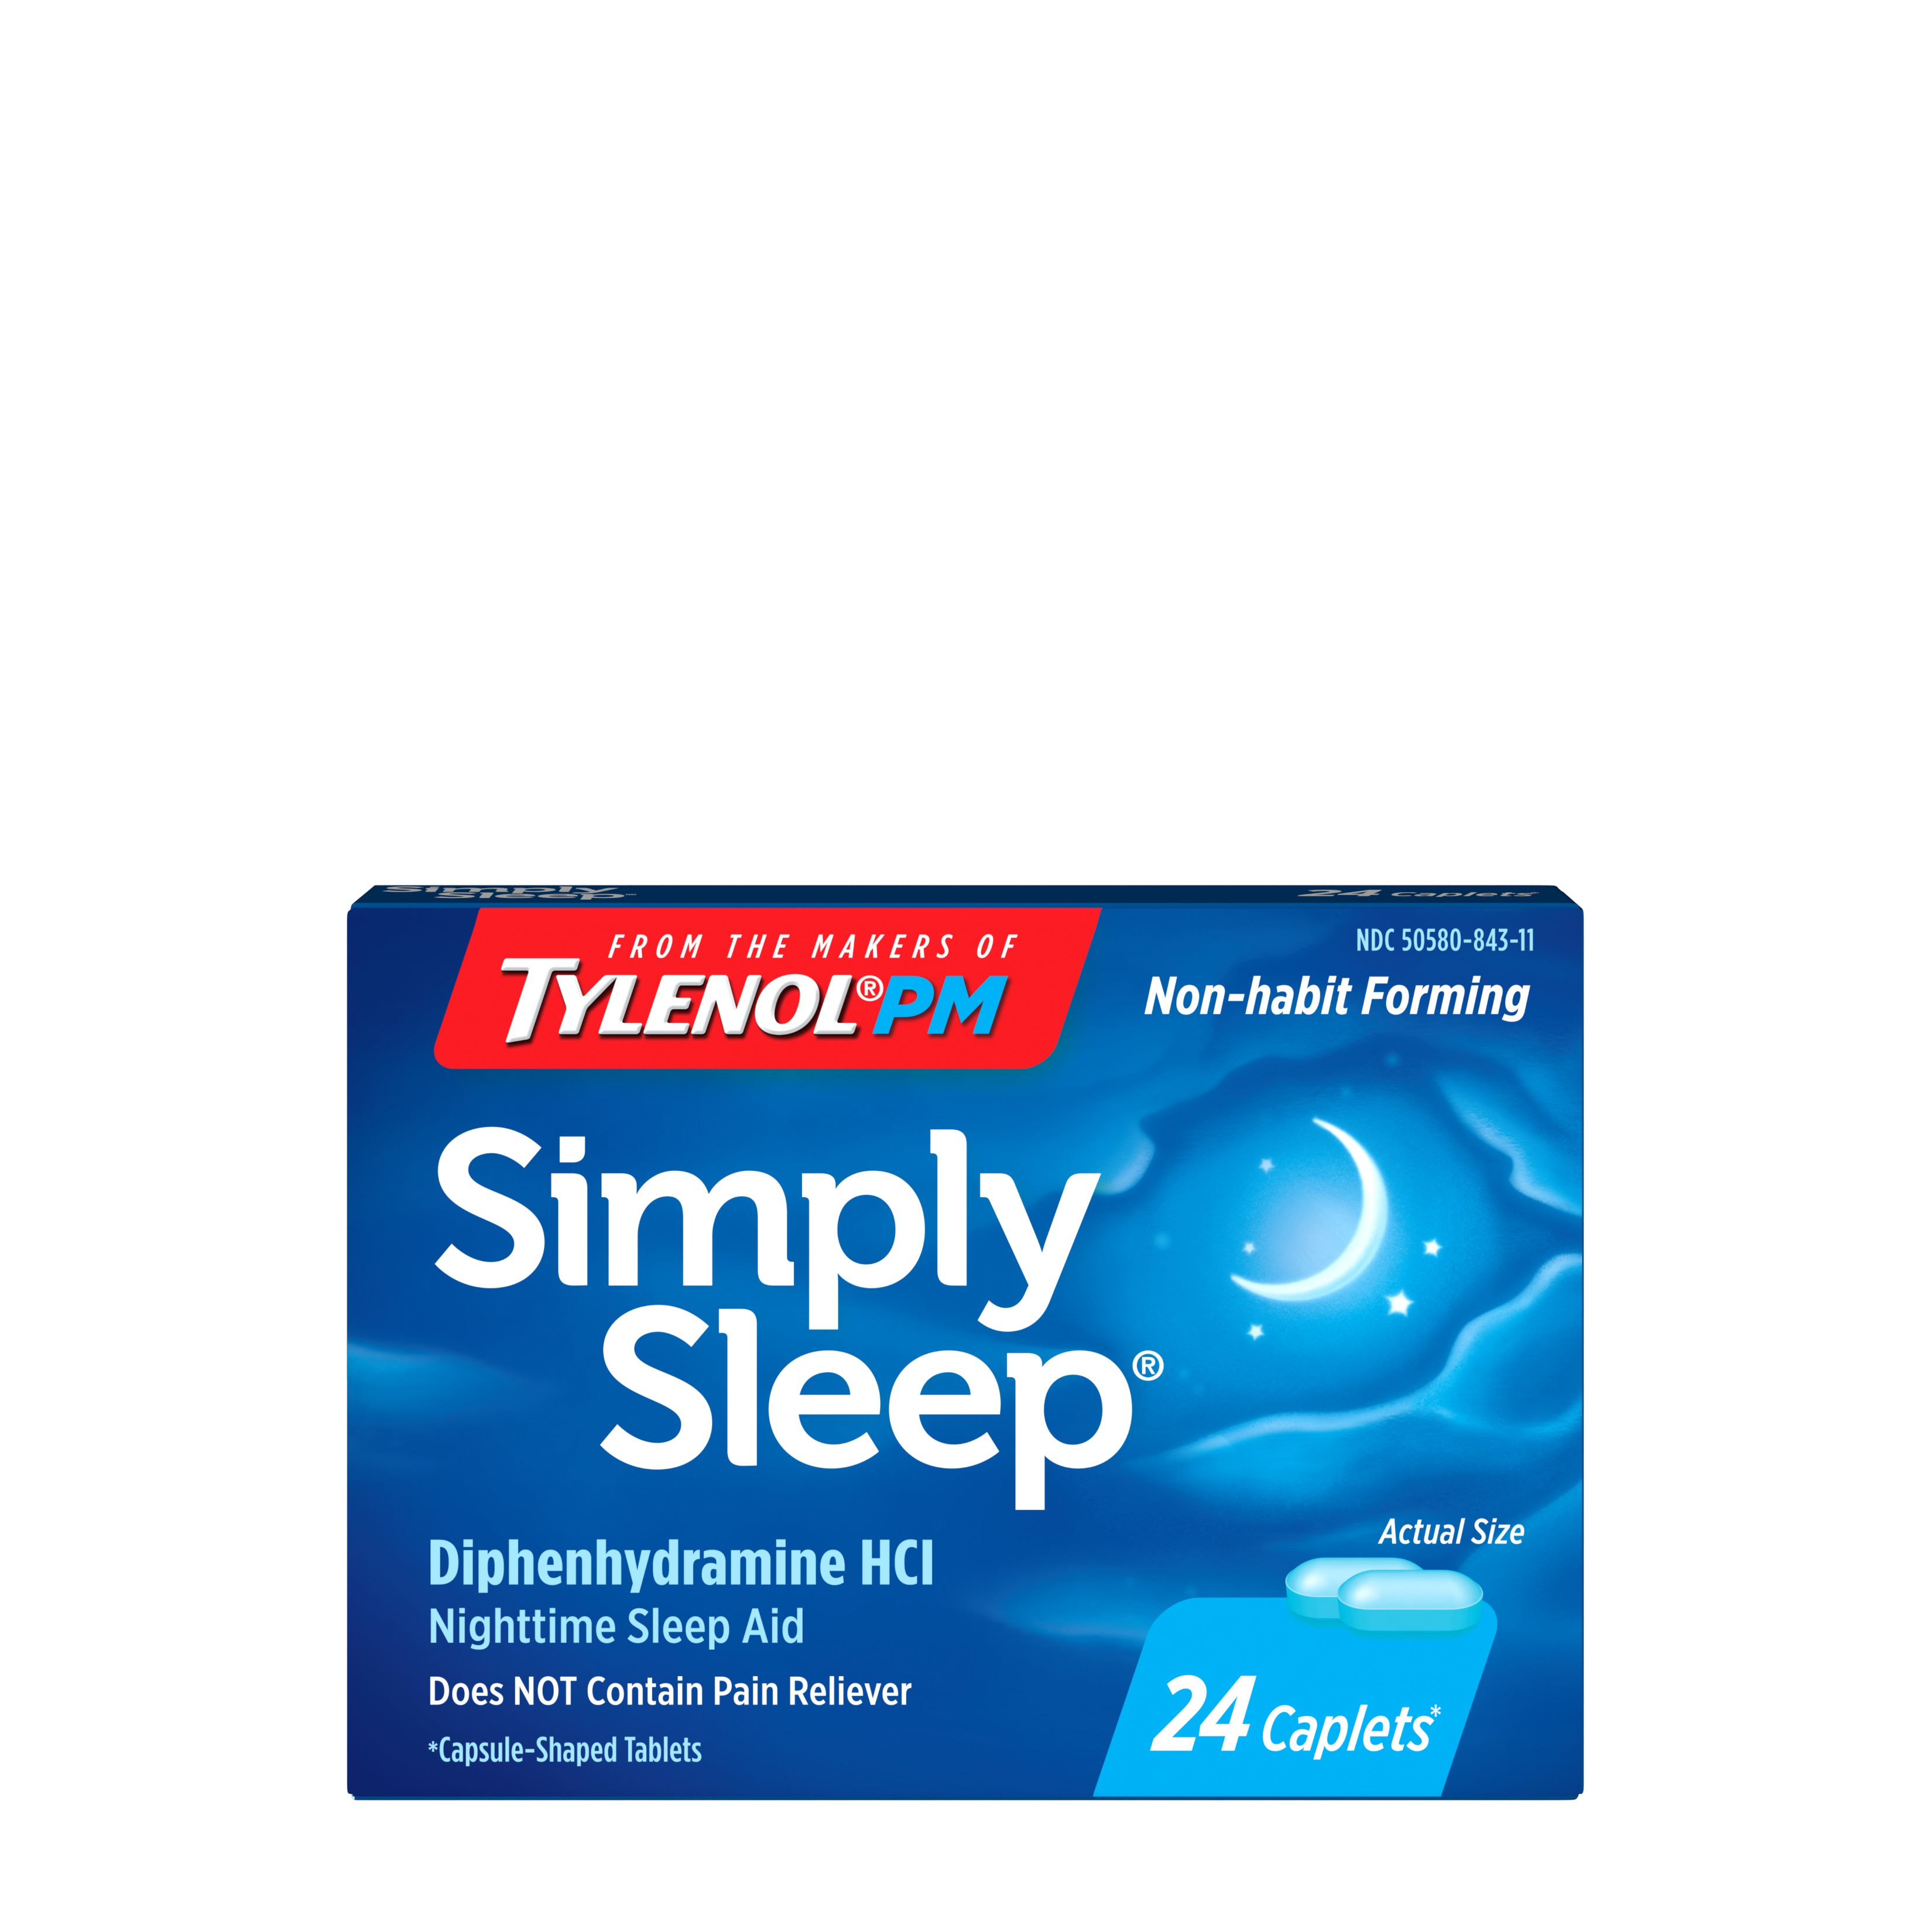 Simply Sleep Non-Habit Forming Nighttime Sleep Aid Caplets, 24 ct